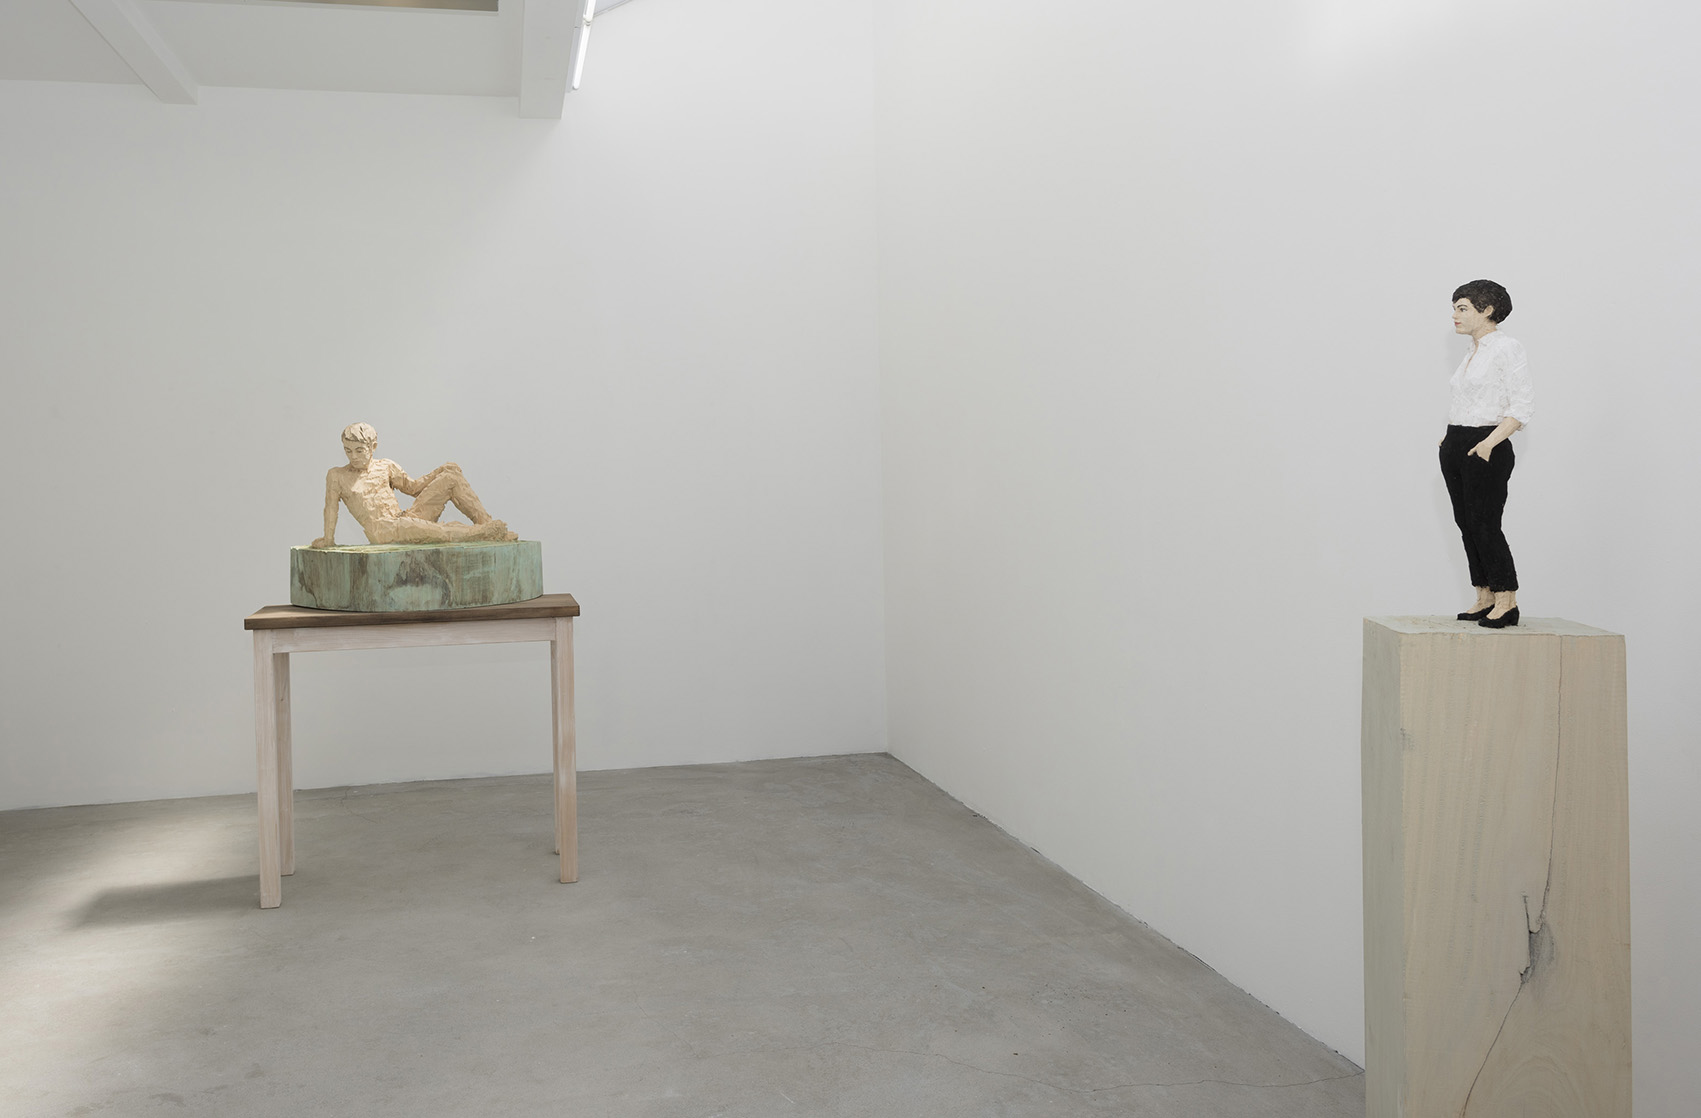 Stephan Balkenhol, installation view AKINCI, 2015